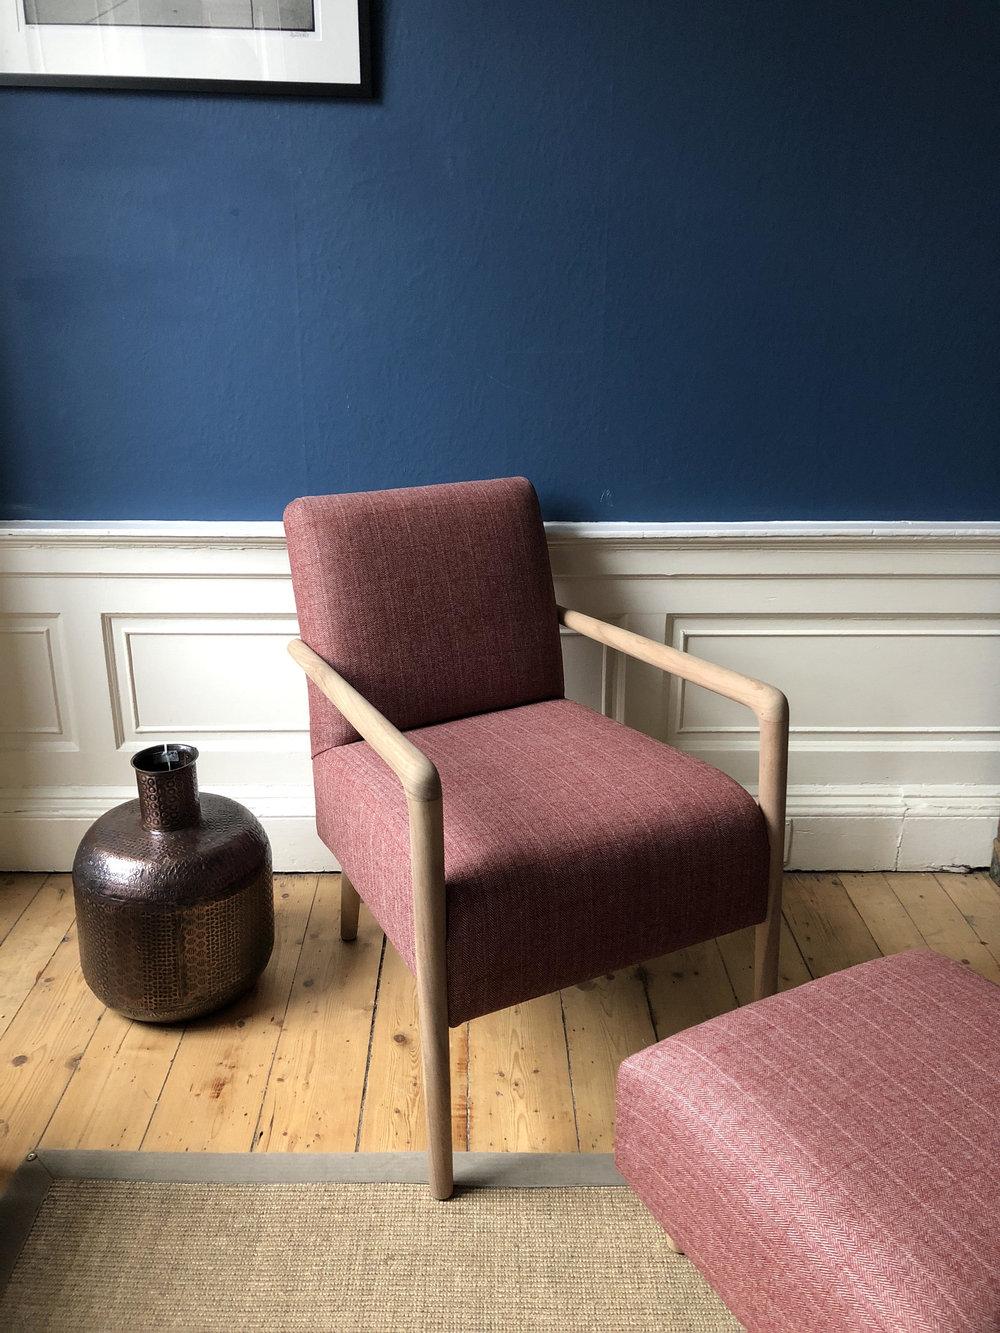 pentland chair.jpg